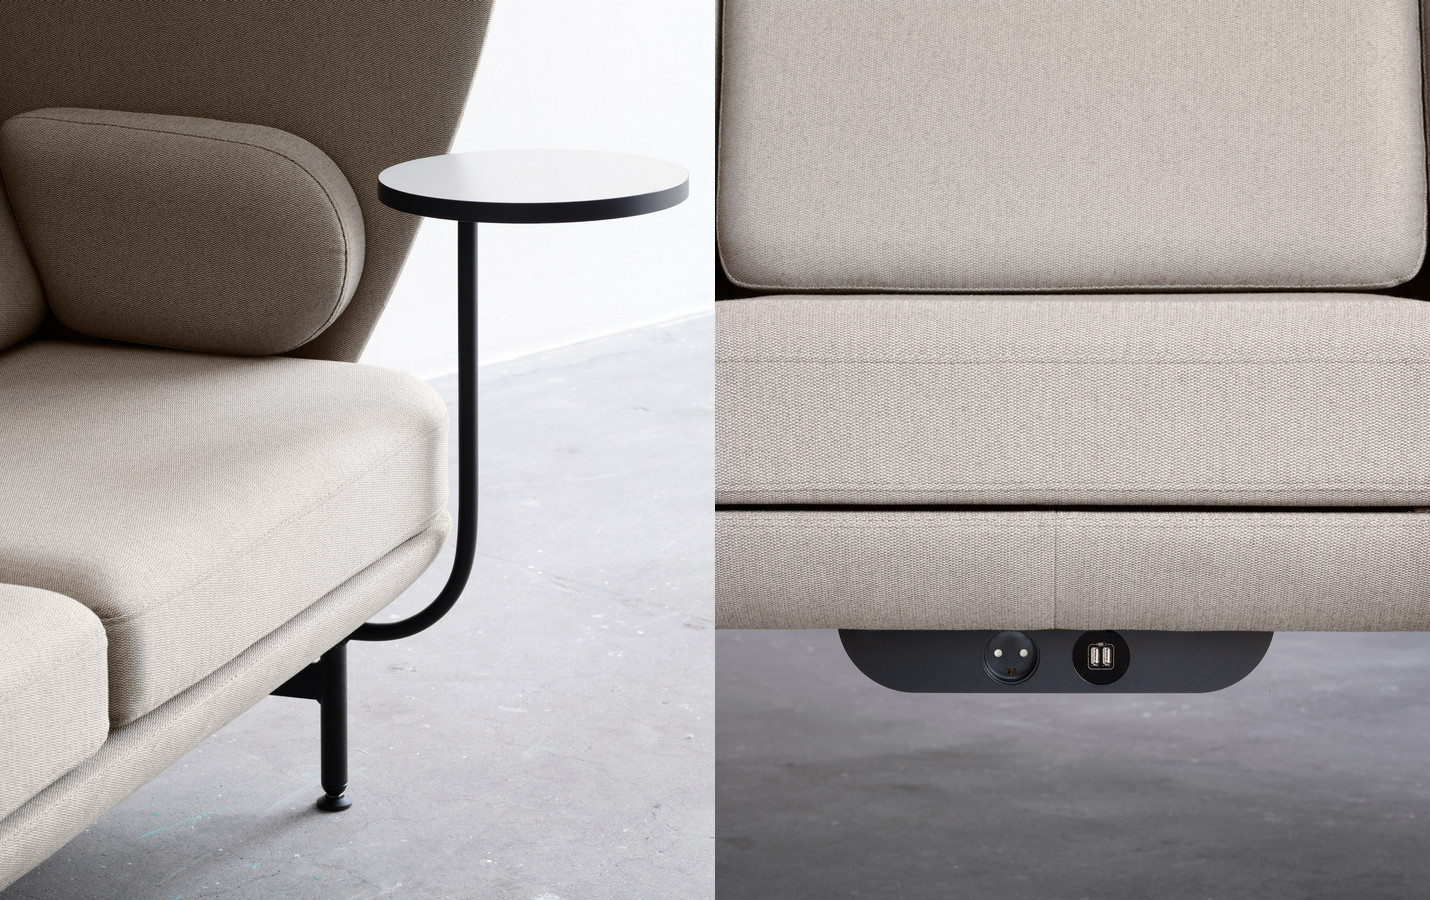 furniture-hybrid-moment-04